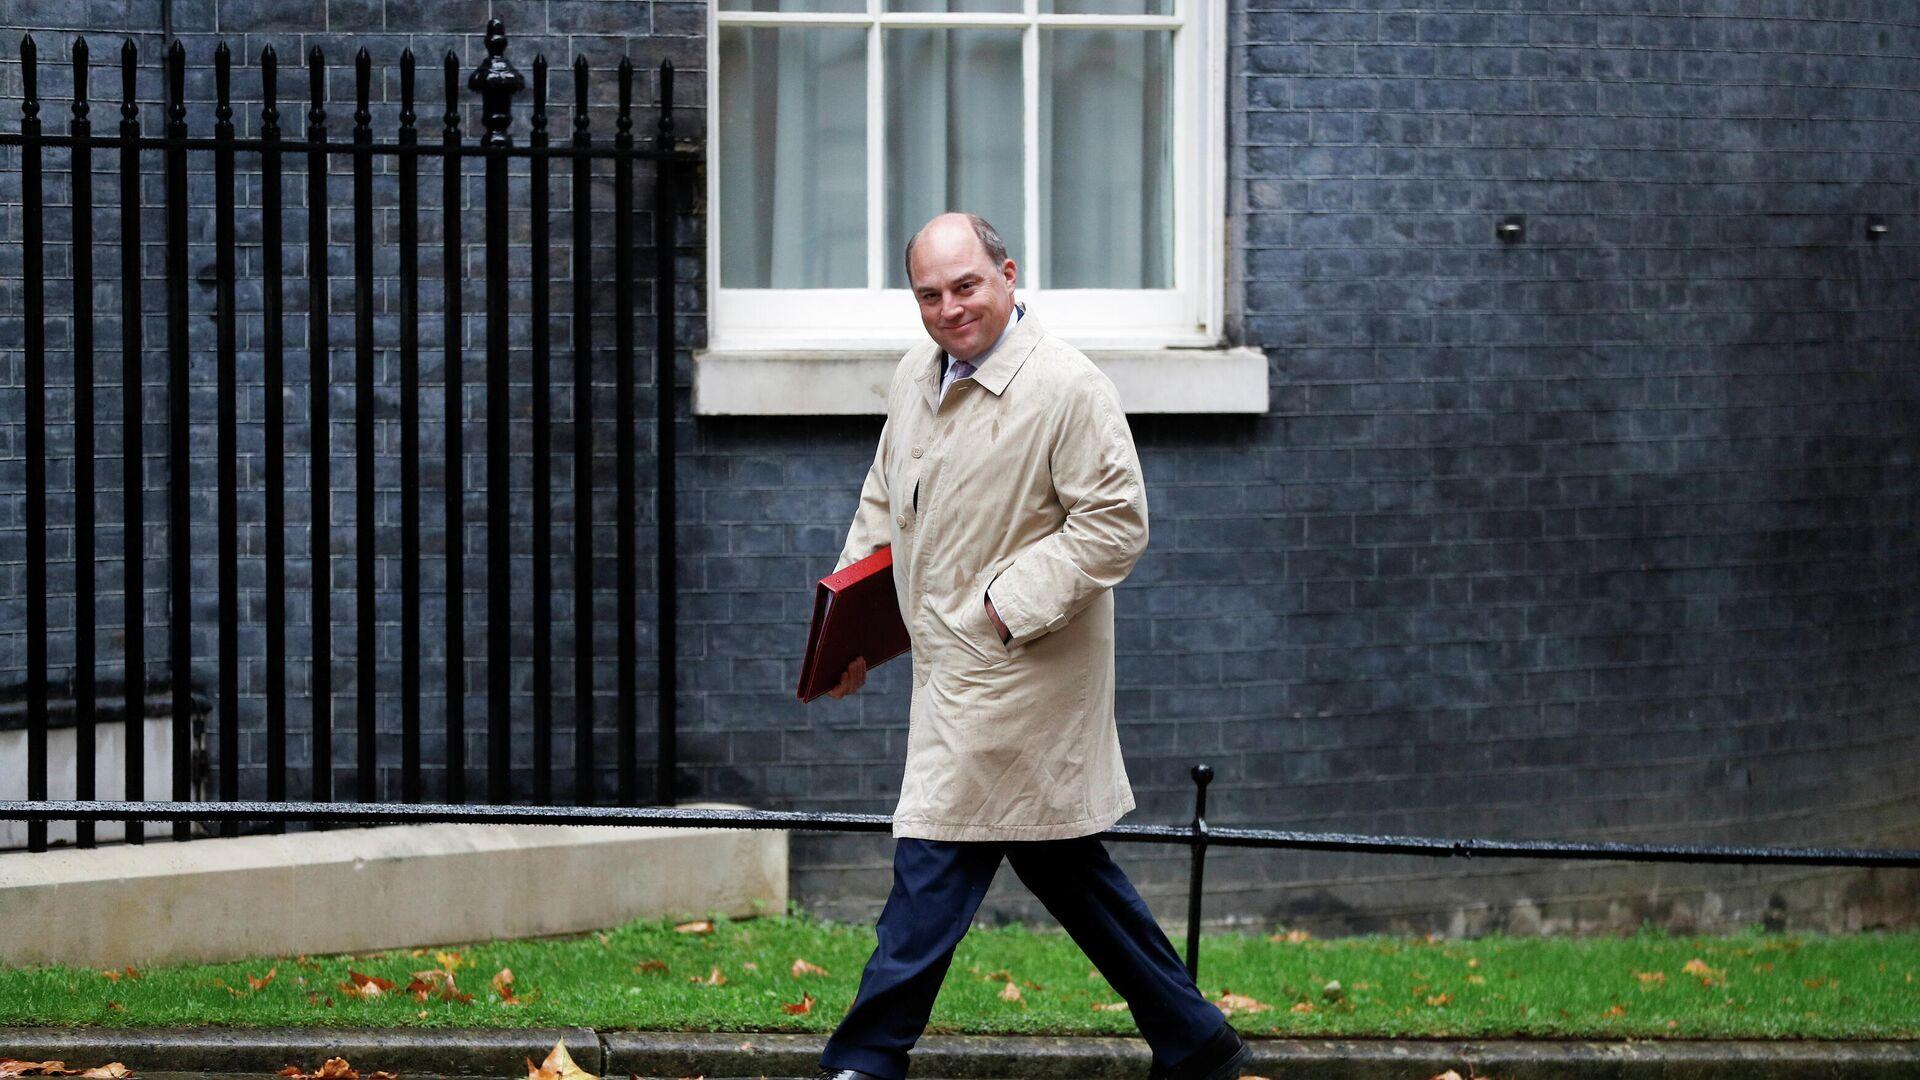 Britain's Defence Secretary Ben Wallace walks outside Downing Street in London, Britain, September 14, 2021.  - Sputnik International, 1920, 19.09.2021